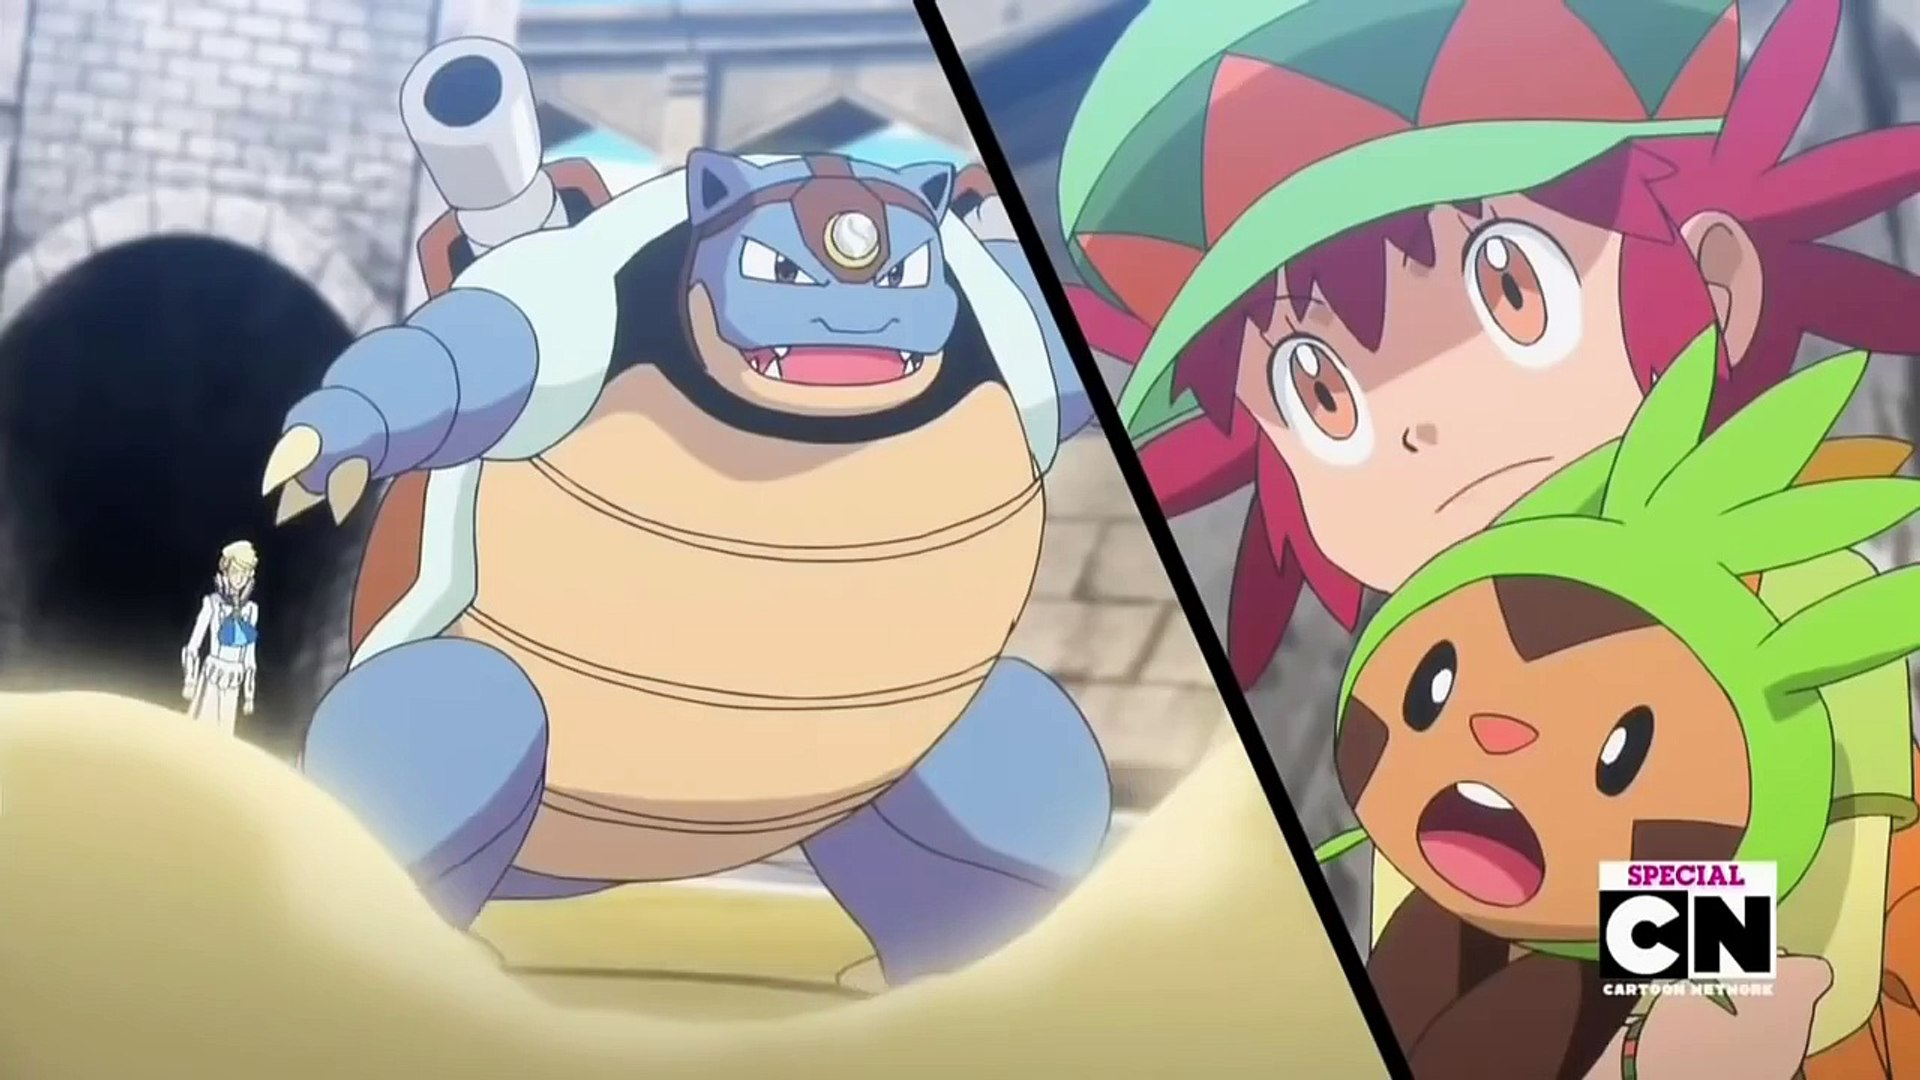 Pokemon XY Special - Mega Blastoise vs. Mega Charizard X - Full Fight HD -  Dailymotion Video